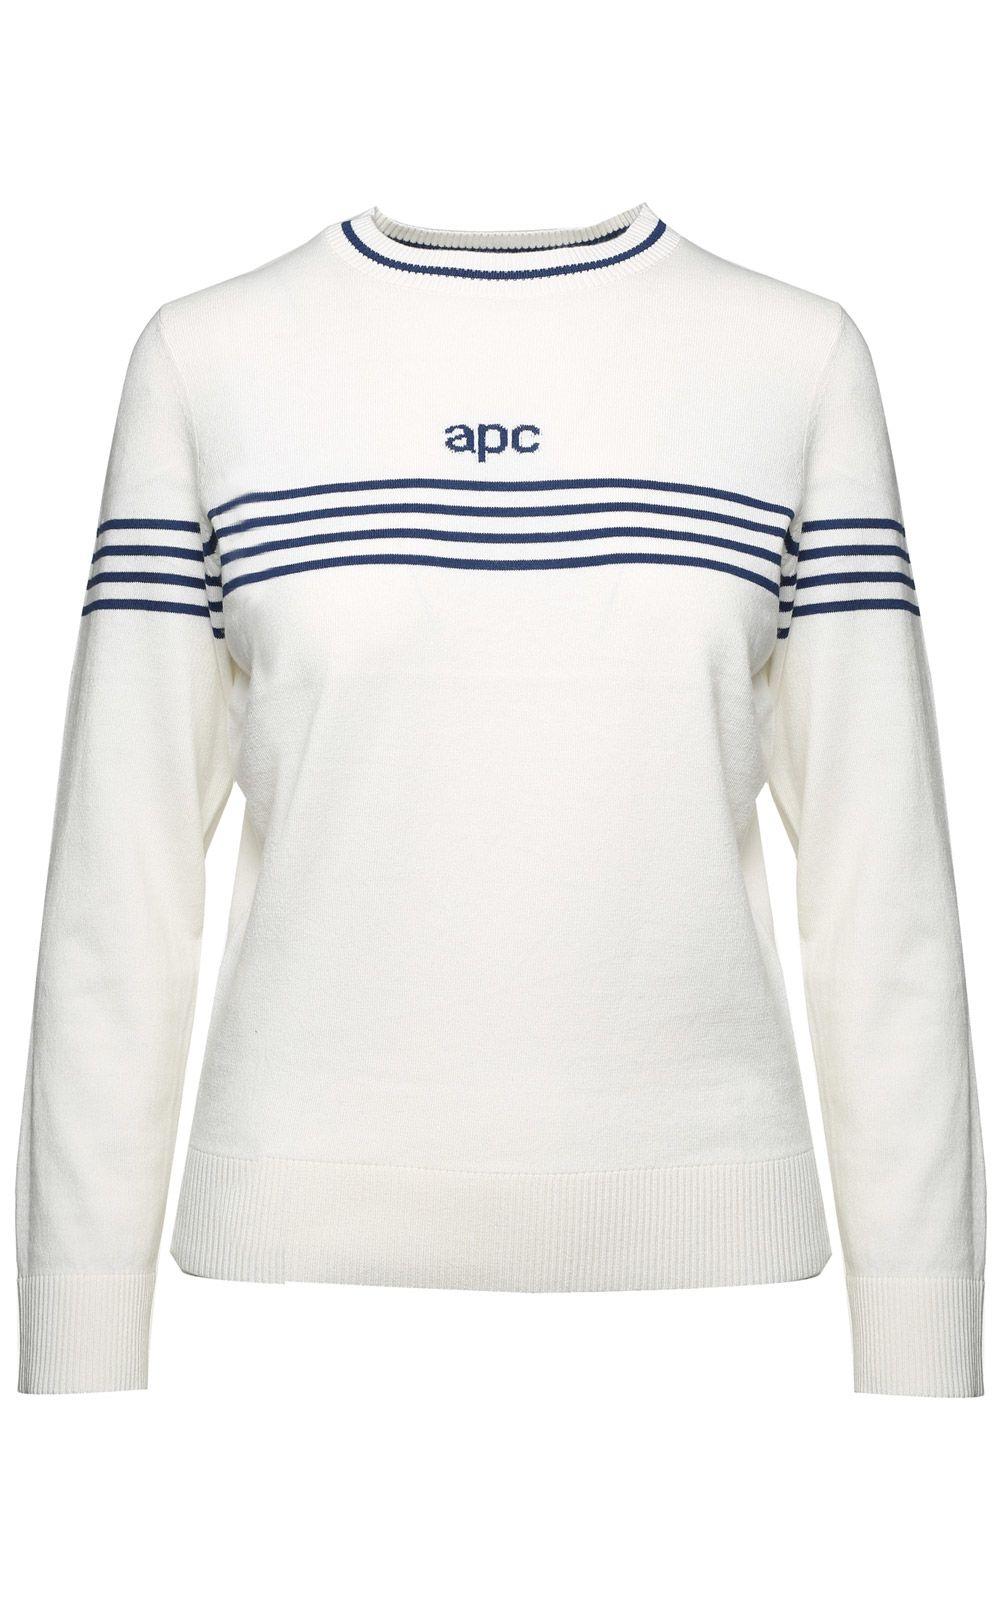 A.P.C. Brand Striped Cotton-blend Sweater